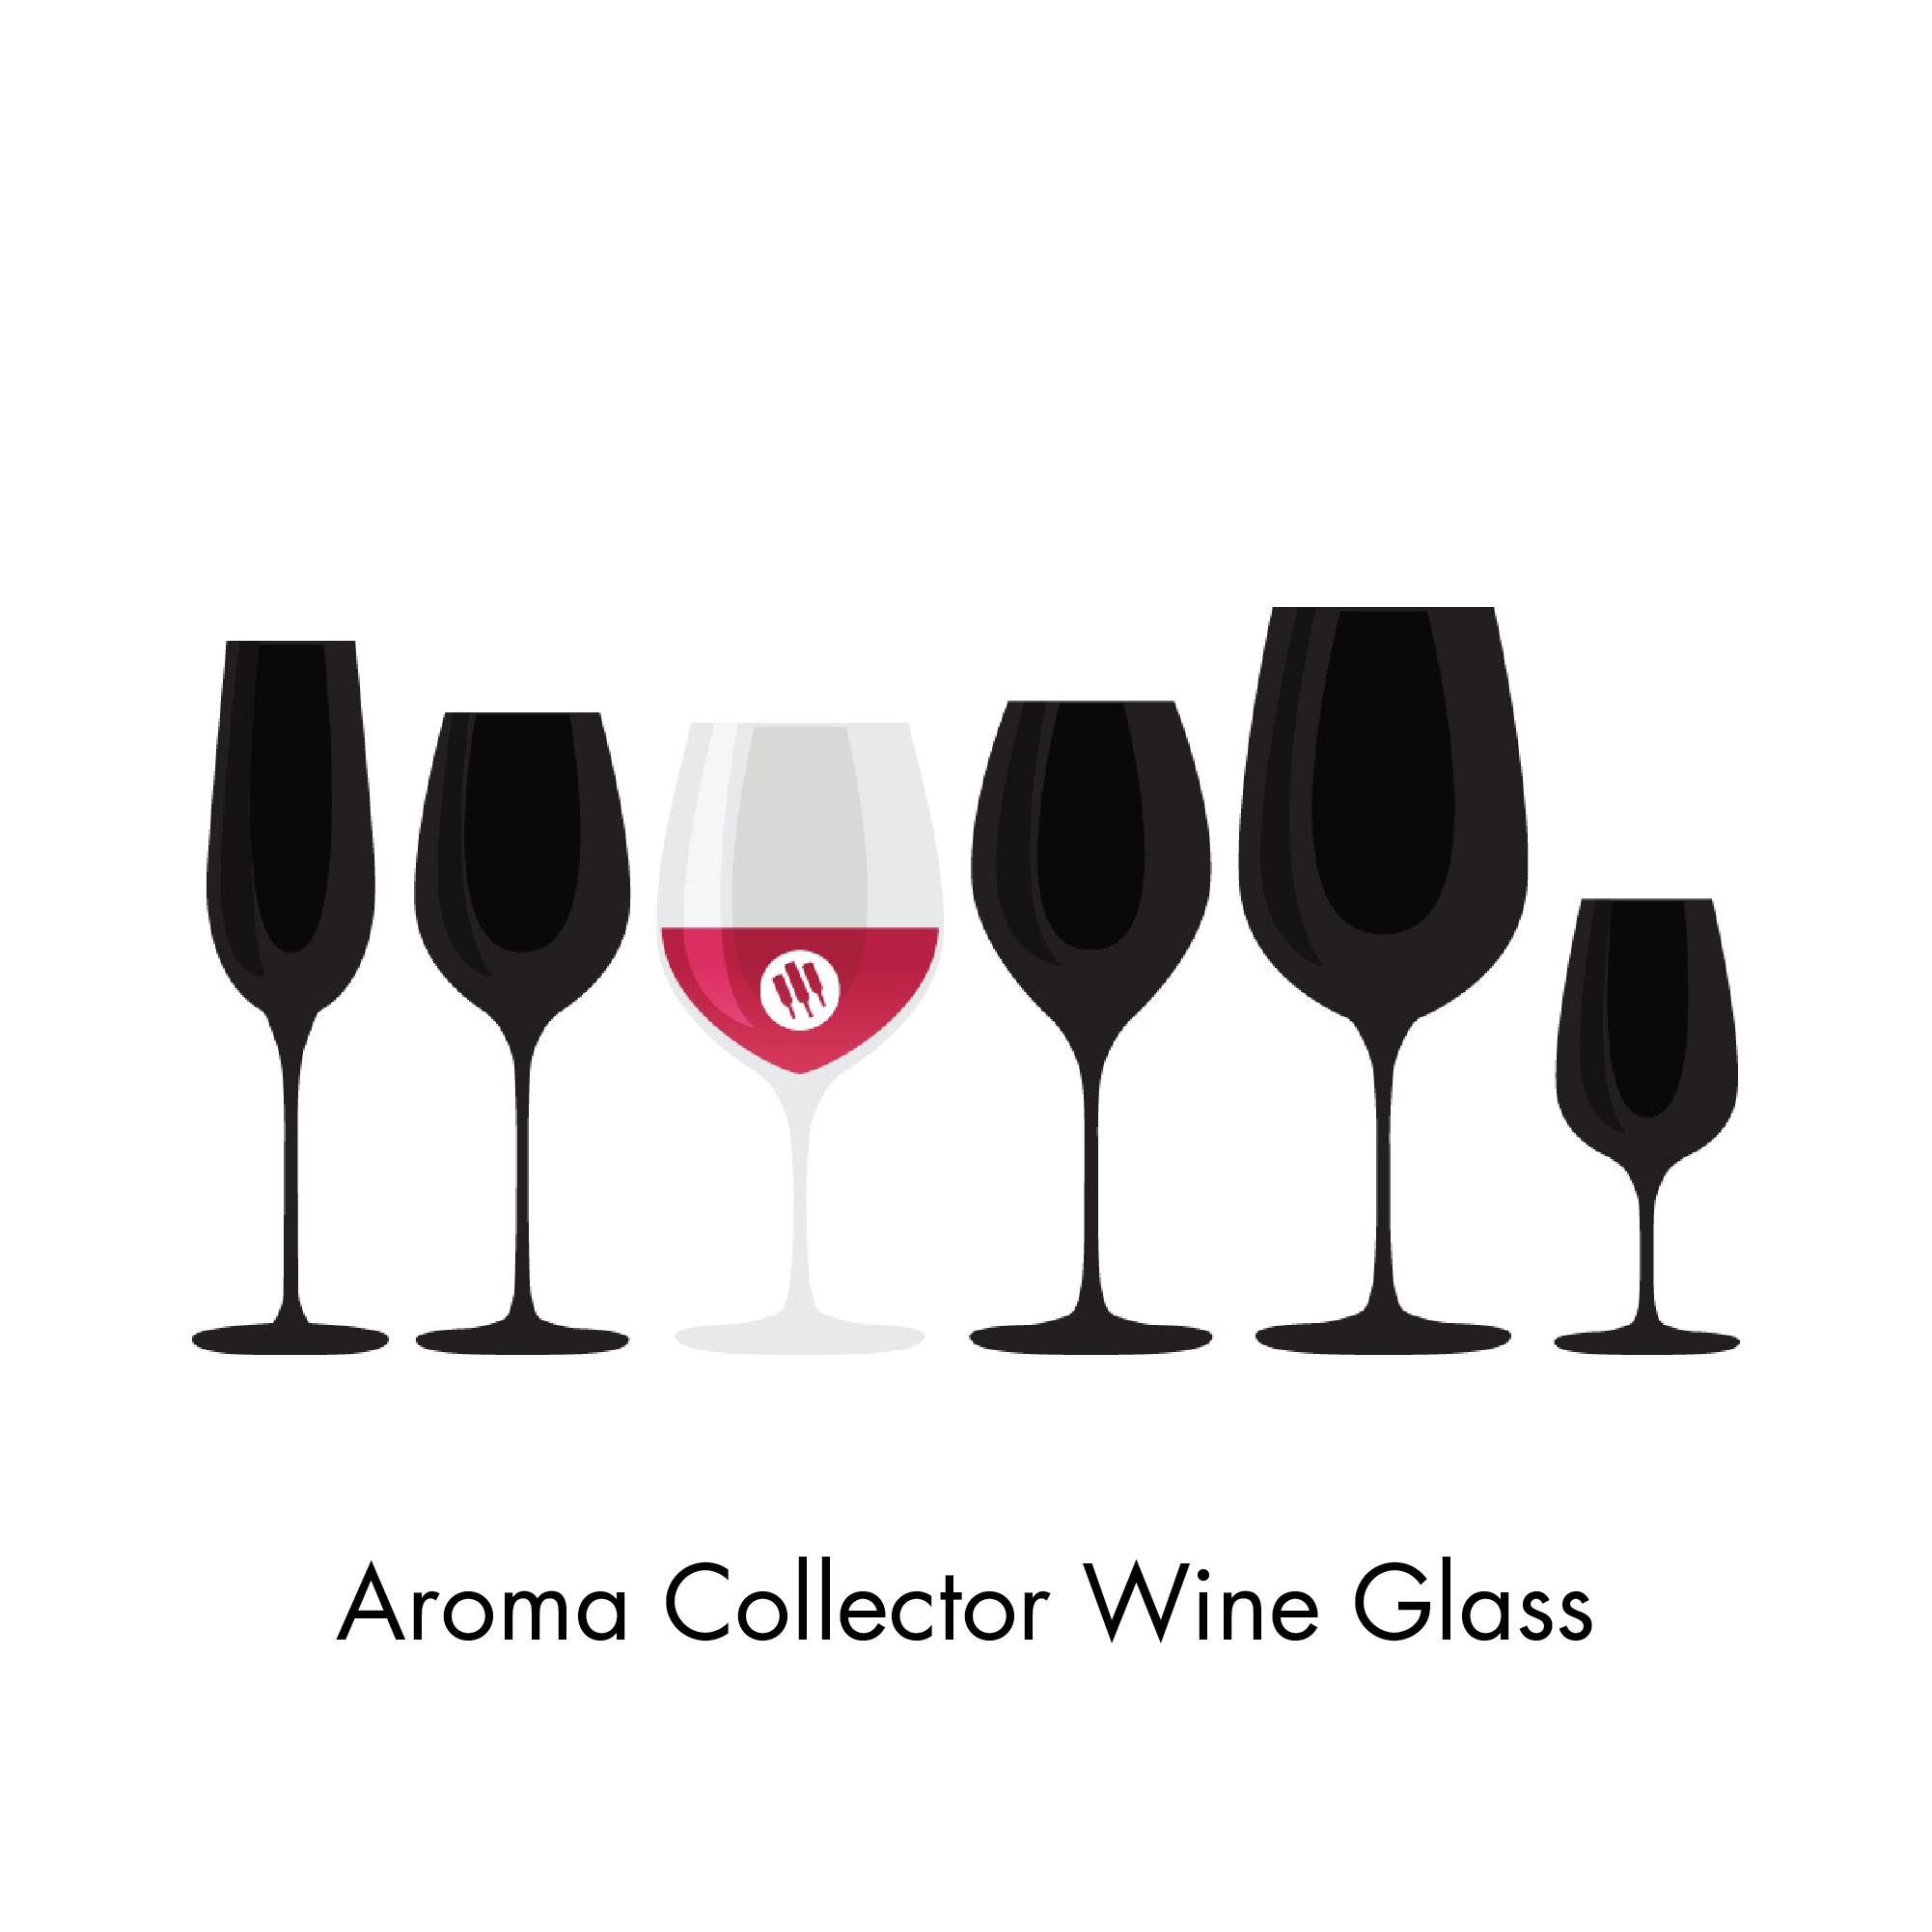 Aroma Collector Wine Glass